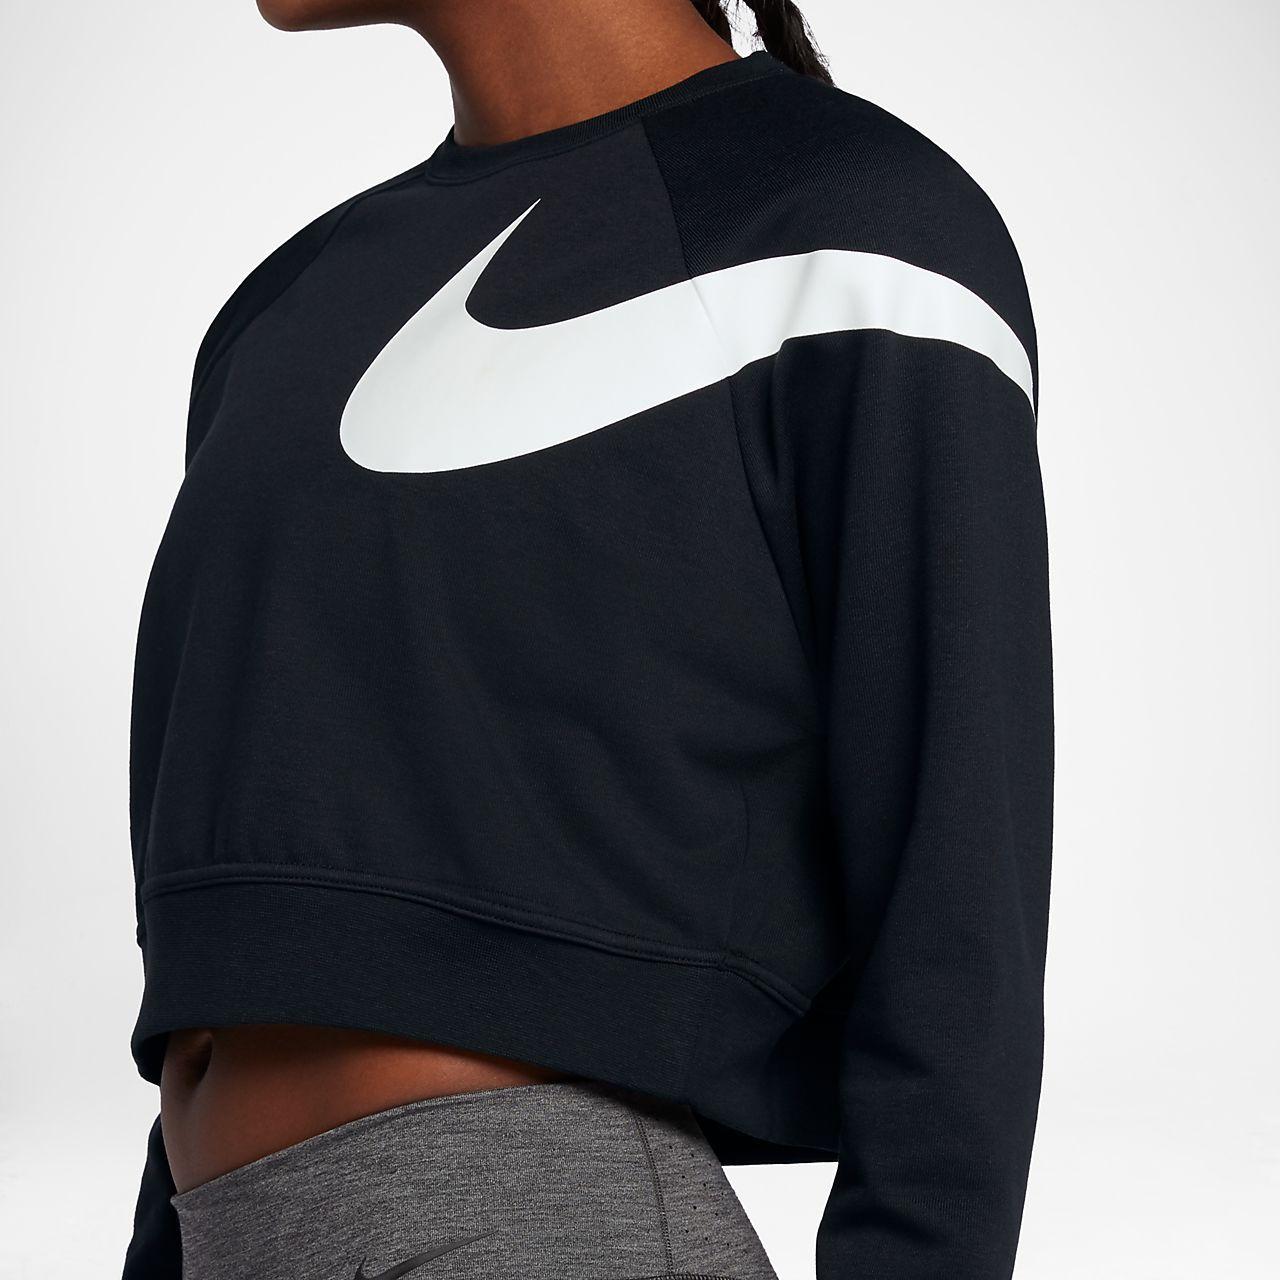 41daf6d691f1 Nike Dry Versa Women s Long Sleeve Training Top